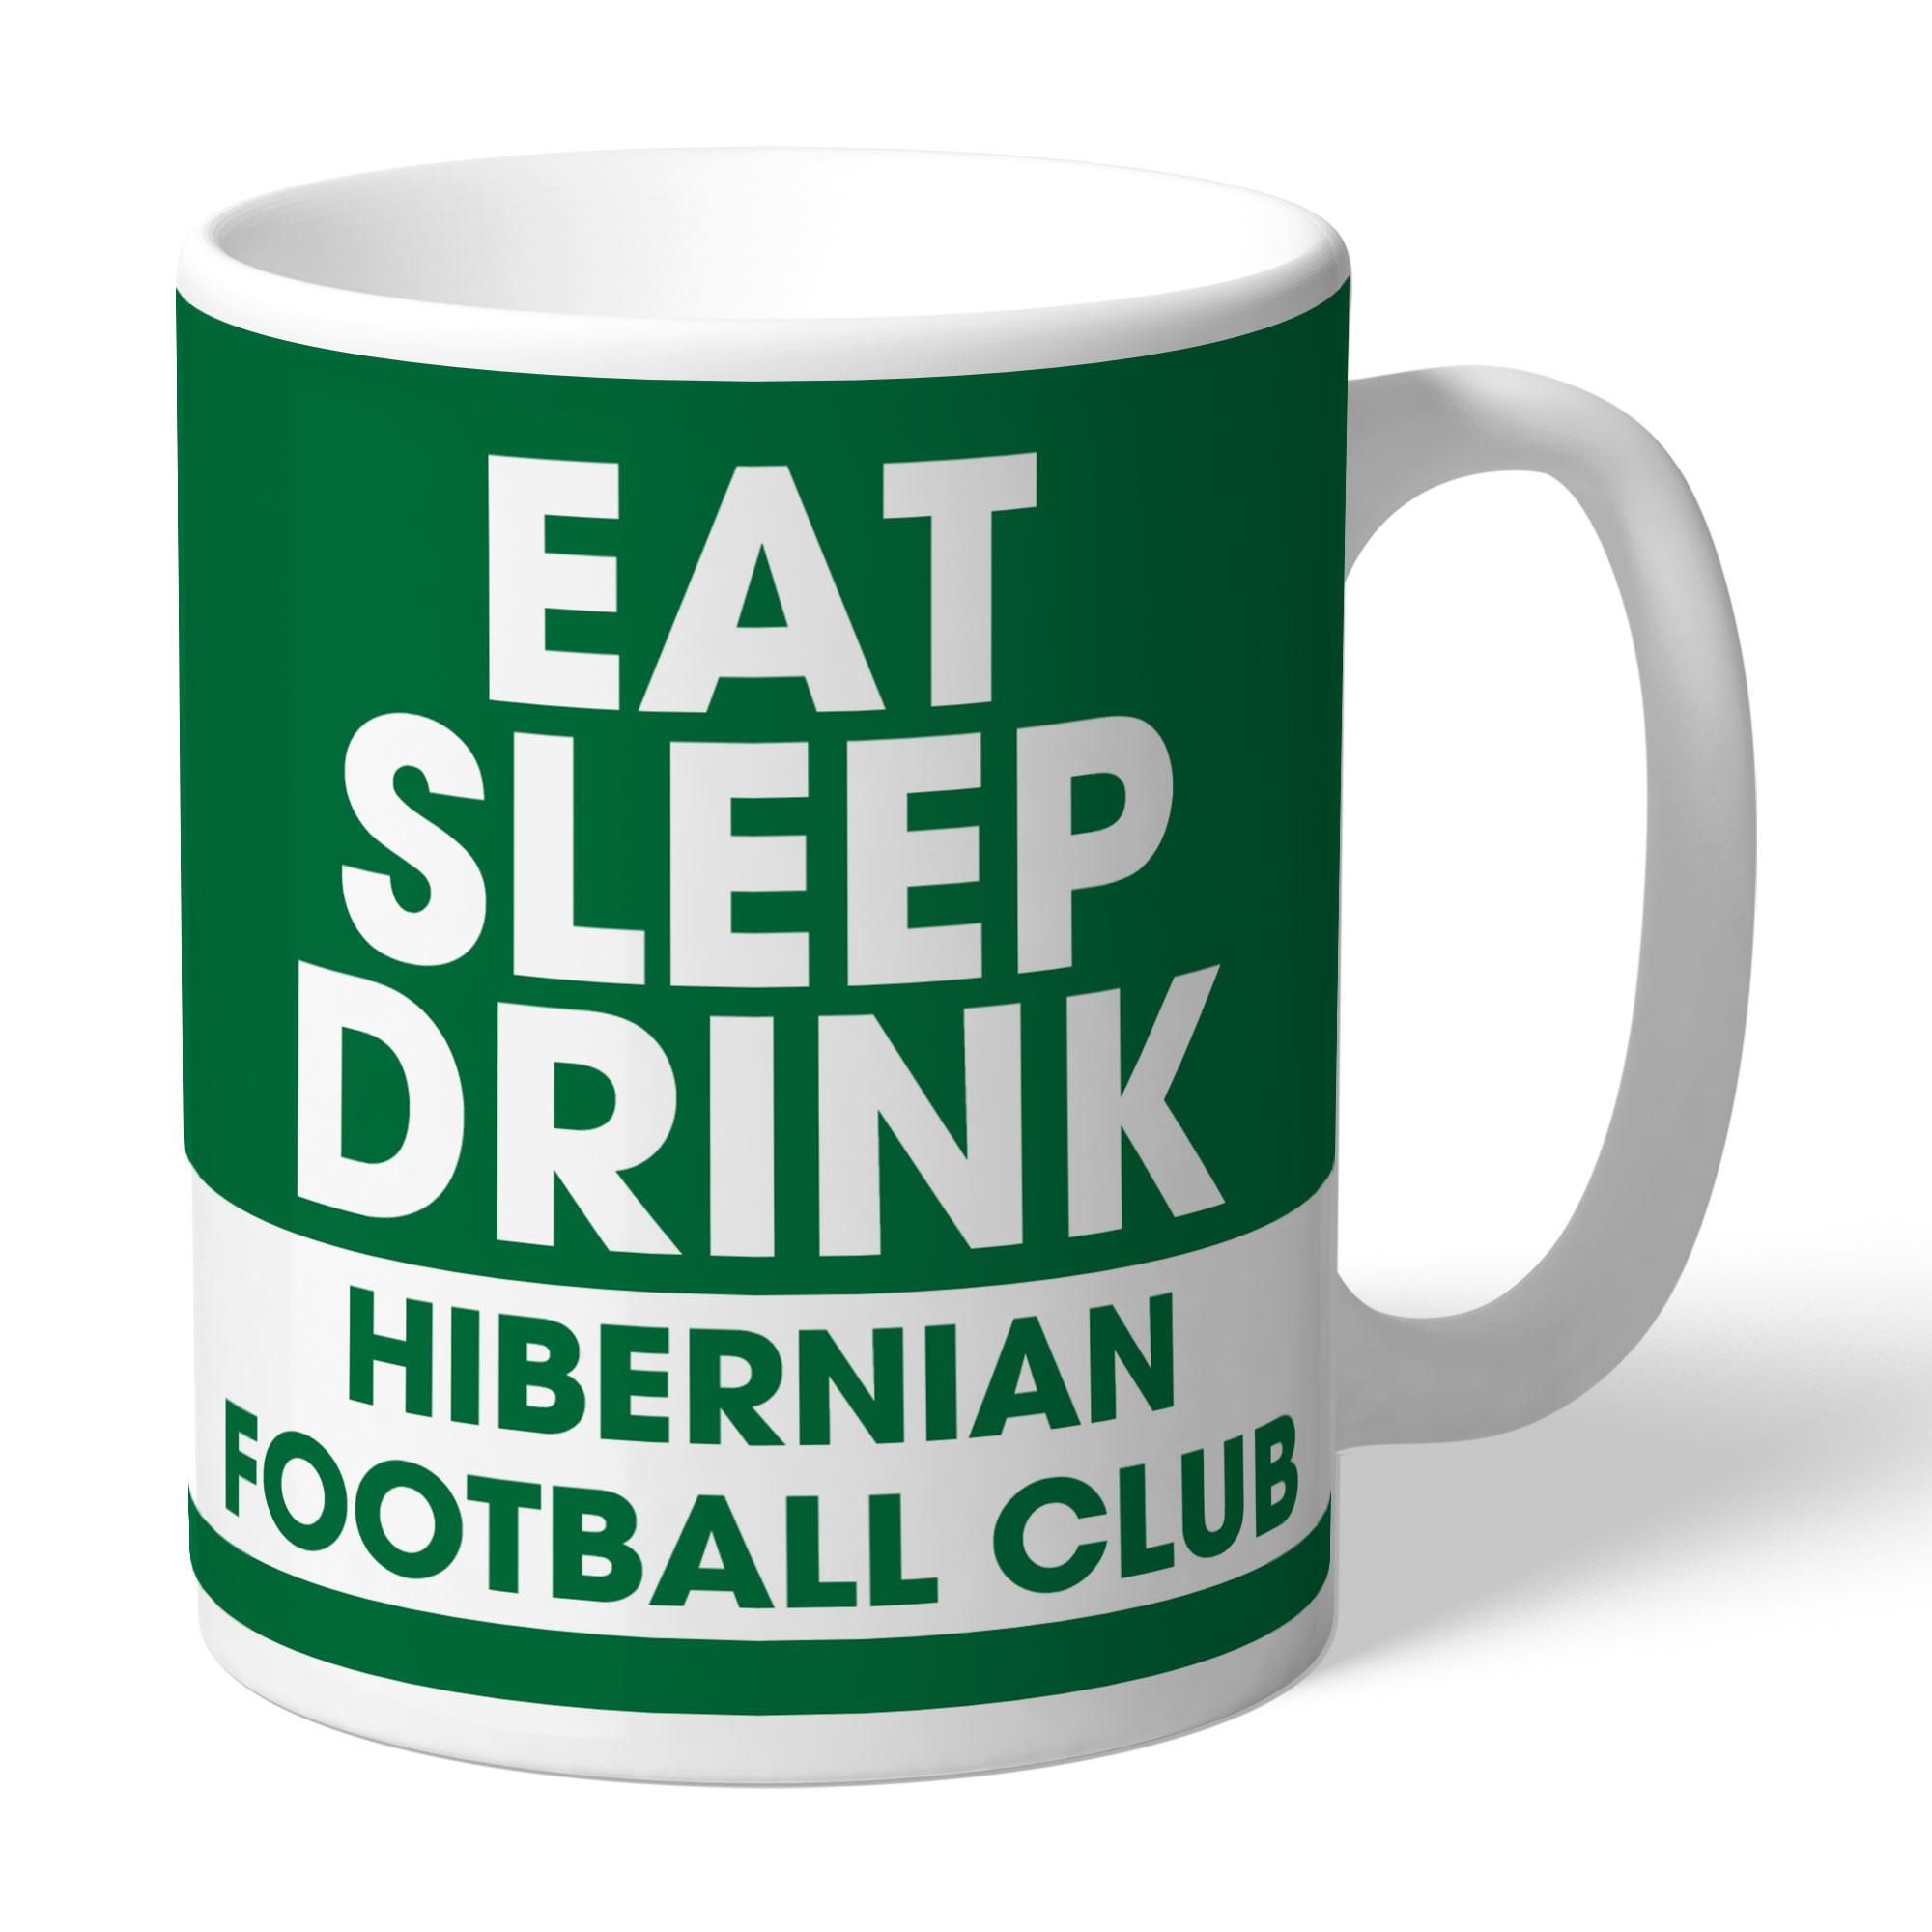 Hibernian FC Eat Sleep Drink Mug